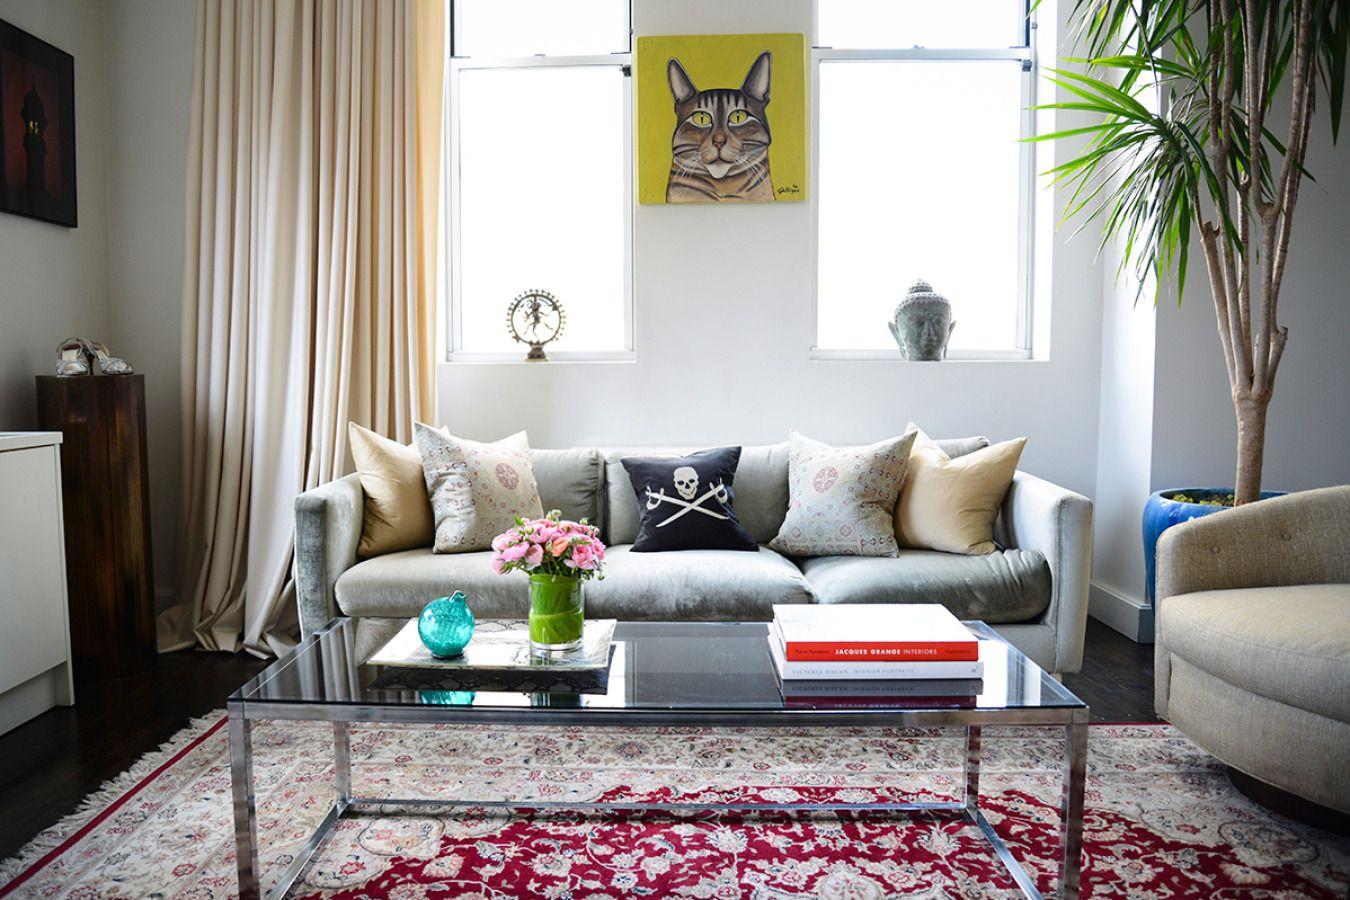 Our Designer's Eclectic Chelsea Apt | Homepolish, Decor ...